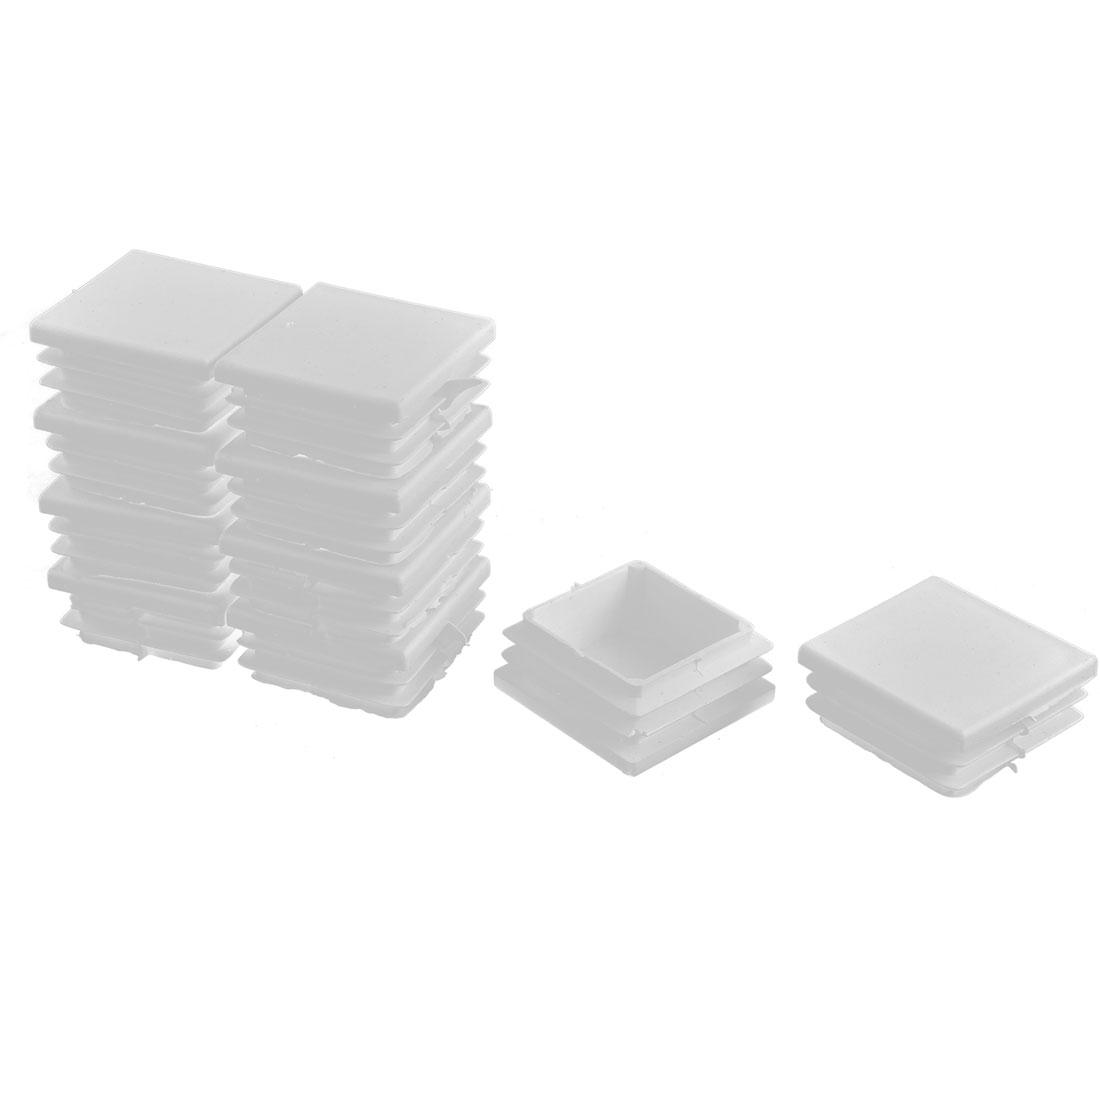 Plastic Square Tube Pipe Inserts End Blanking Caps White 38mmx38mm 10 Pcs